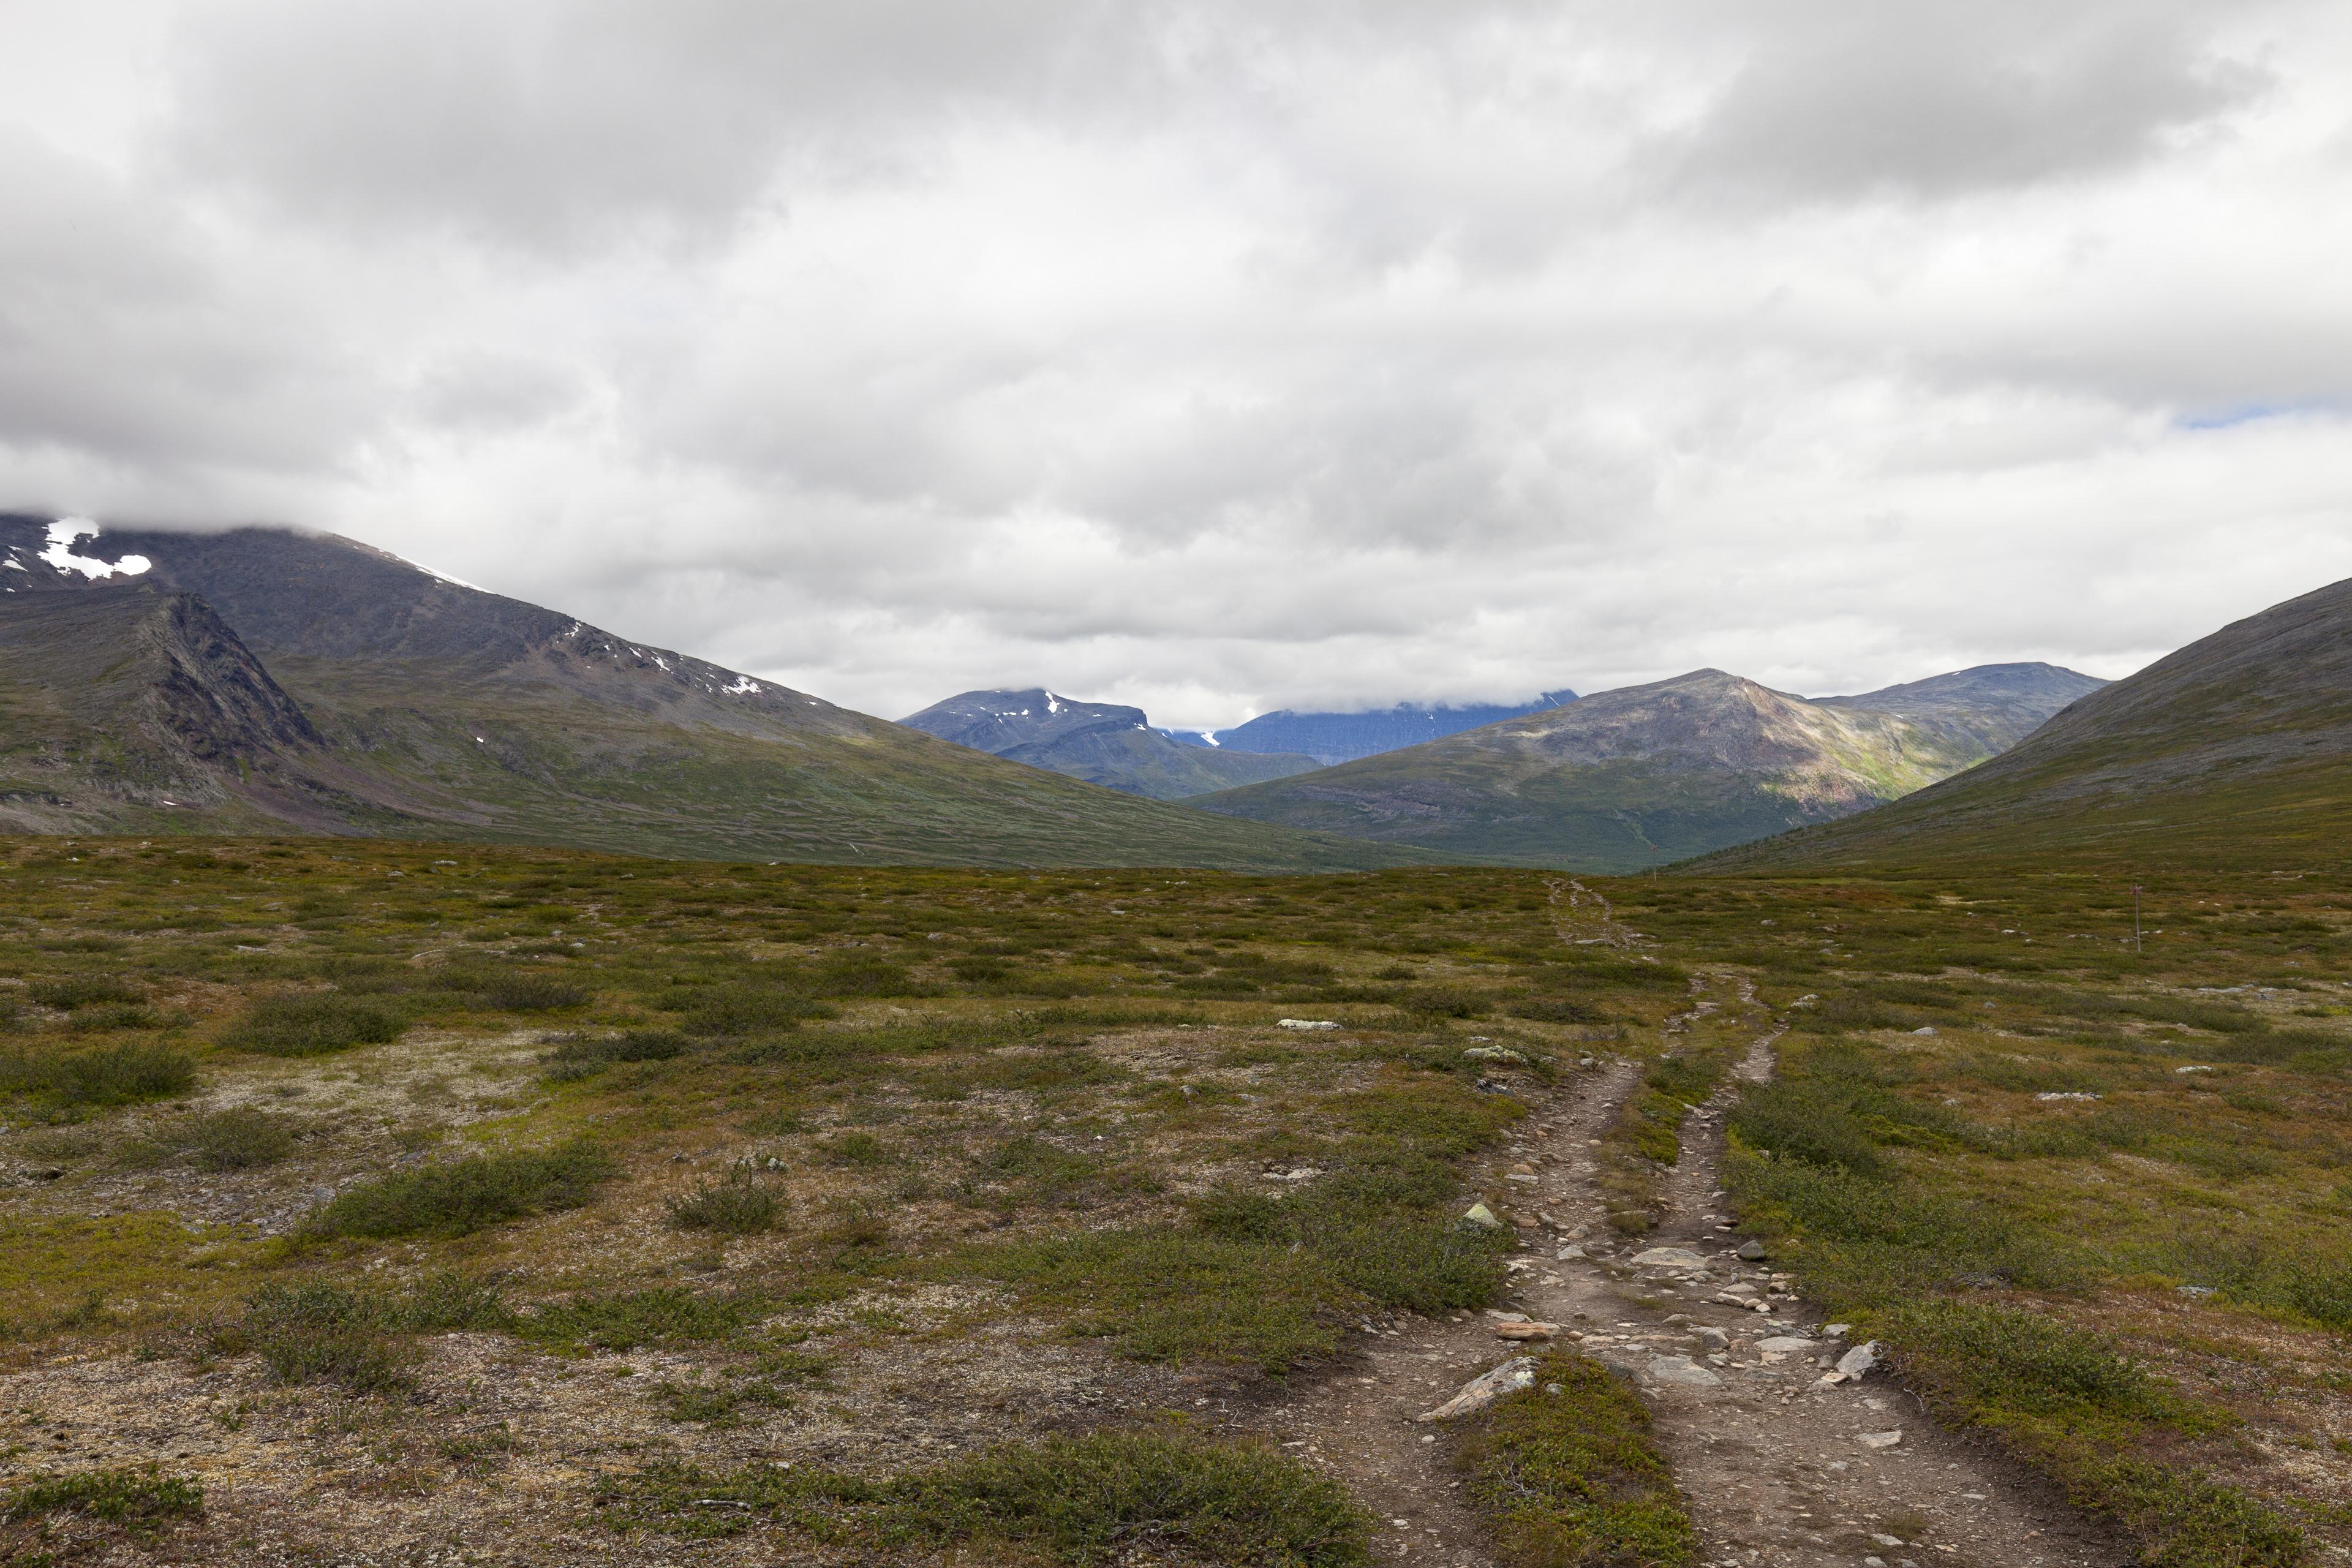 Blick zurück in Richtung Kaitumjaure,©Markus Proske—Canon EOS 5D Mark II, EF16-35mm f/4L IS USM, 28mm, 1/100s, Blende 11, ISO 200